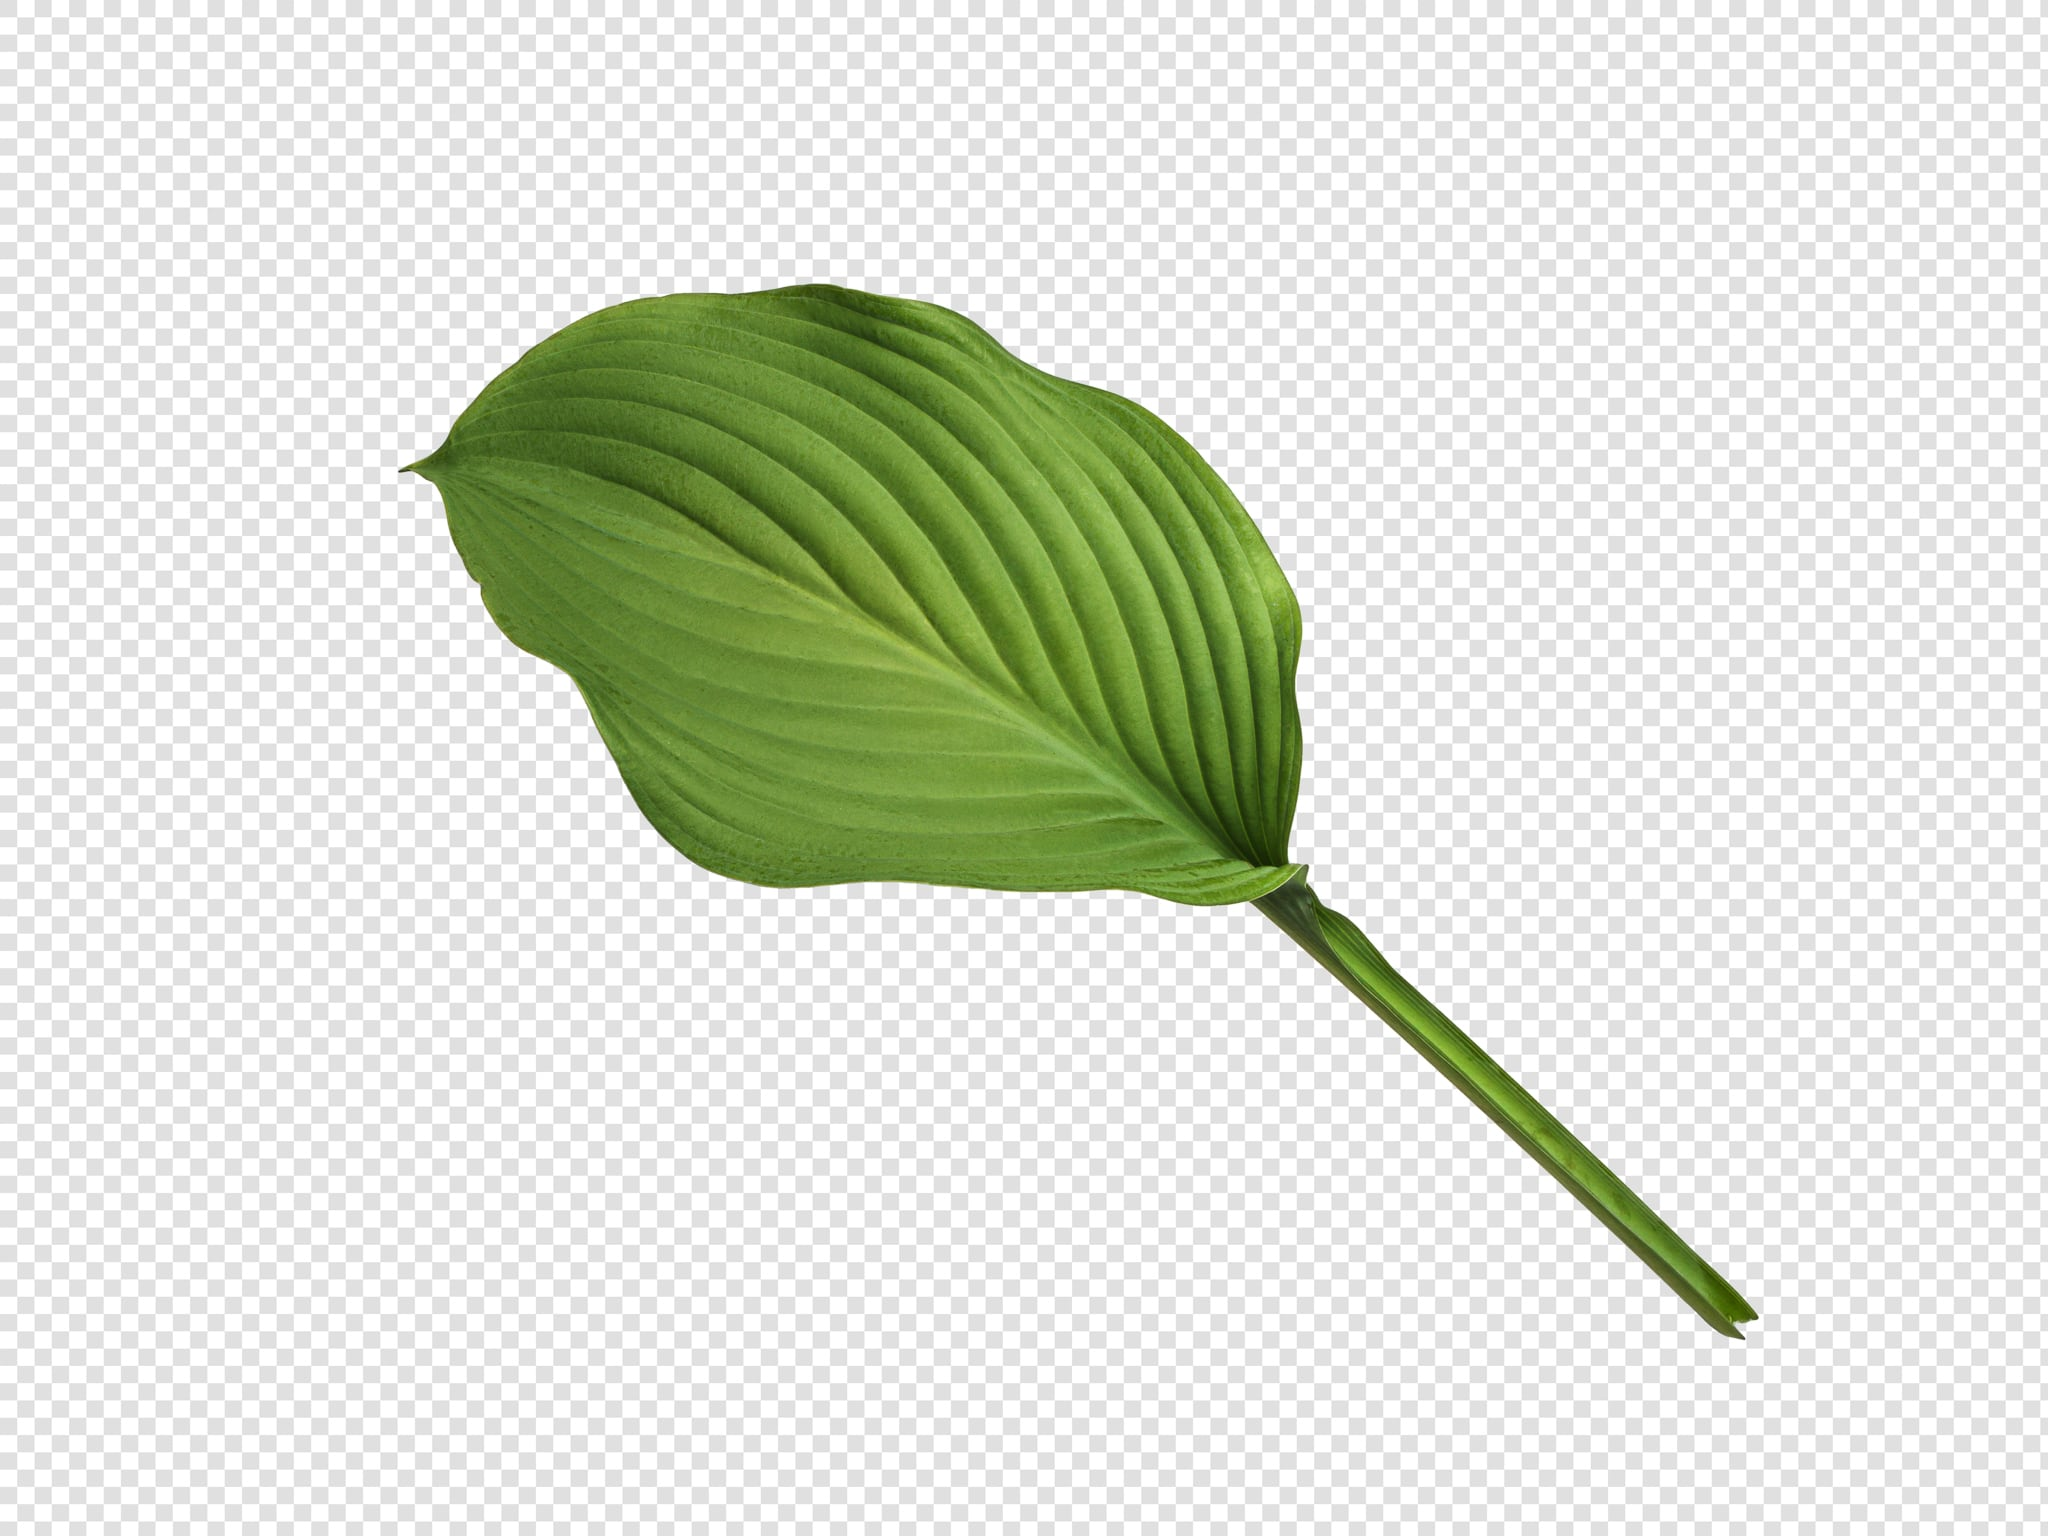 Leaf PSD isolated image